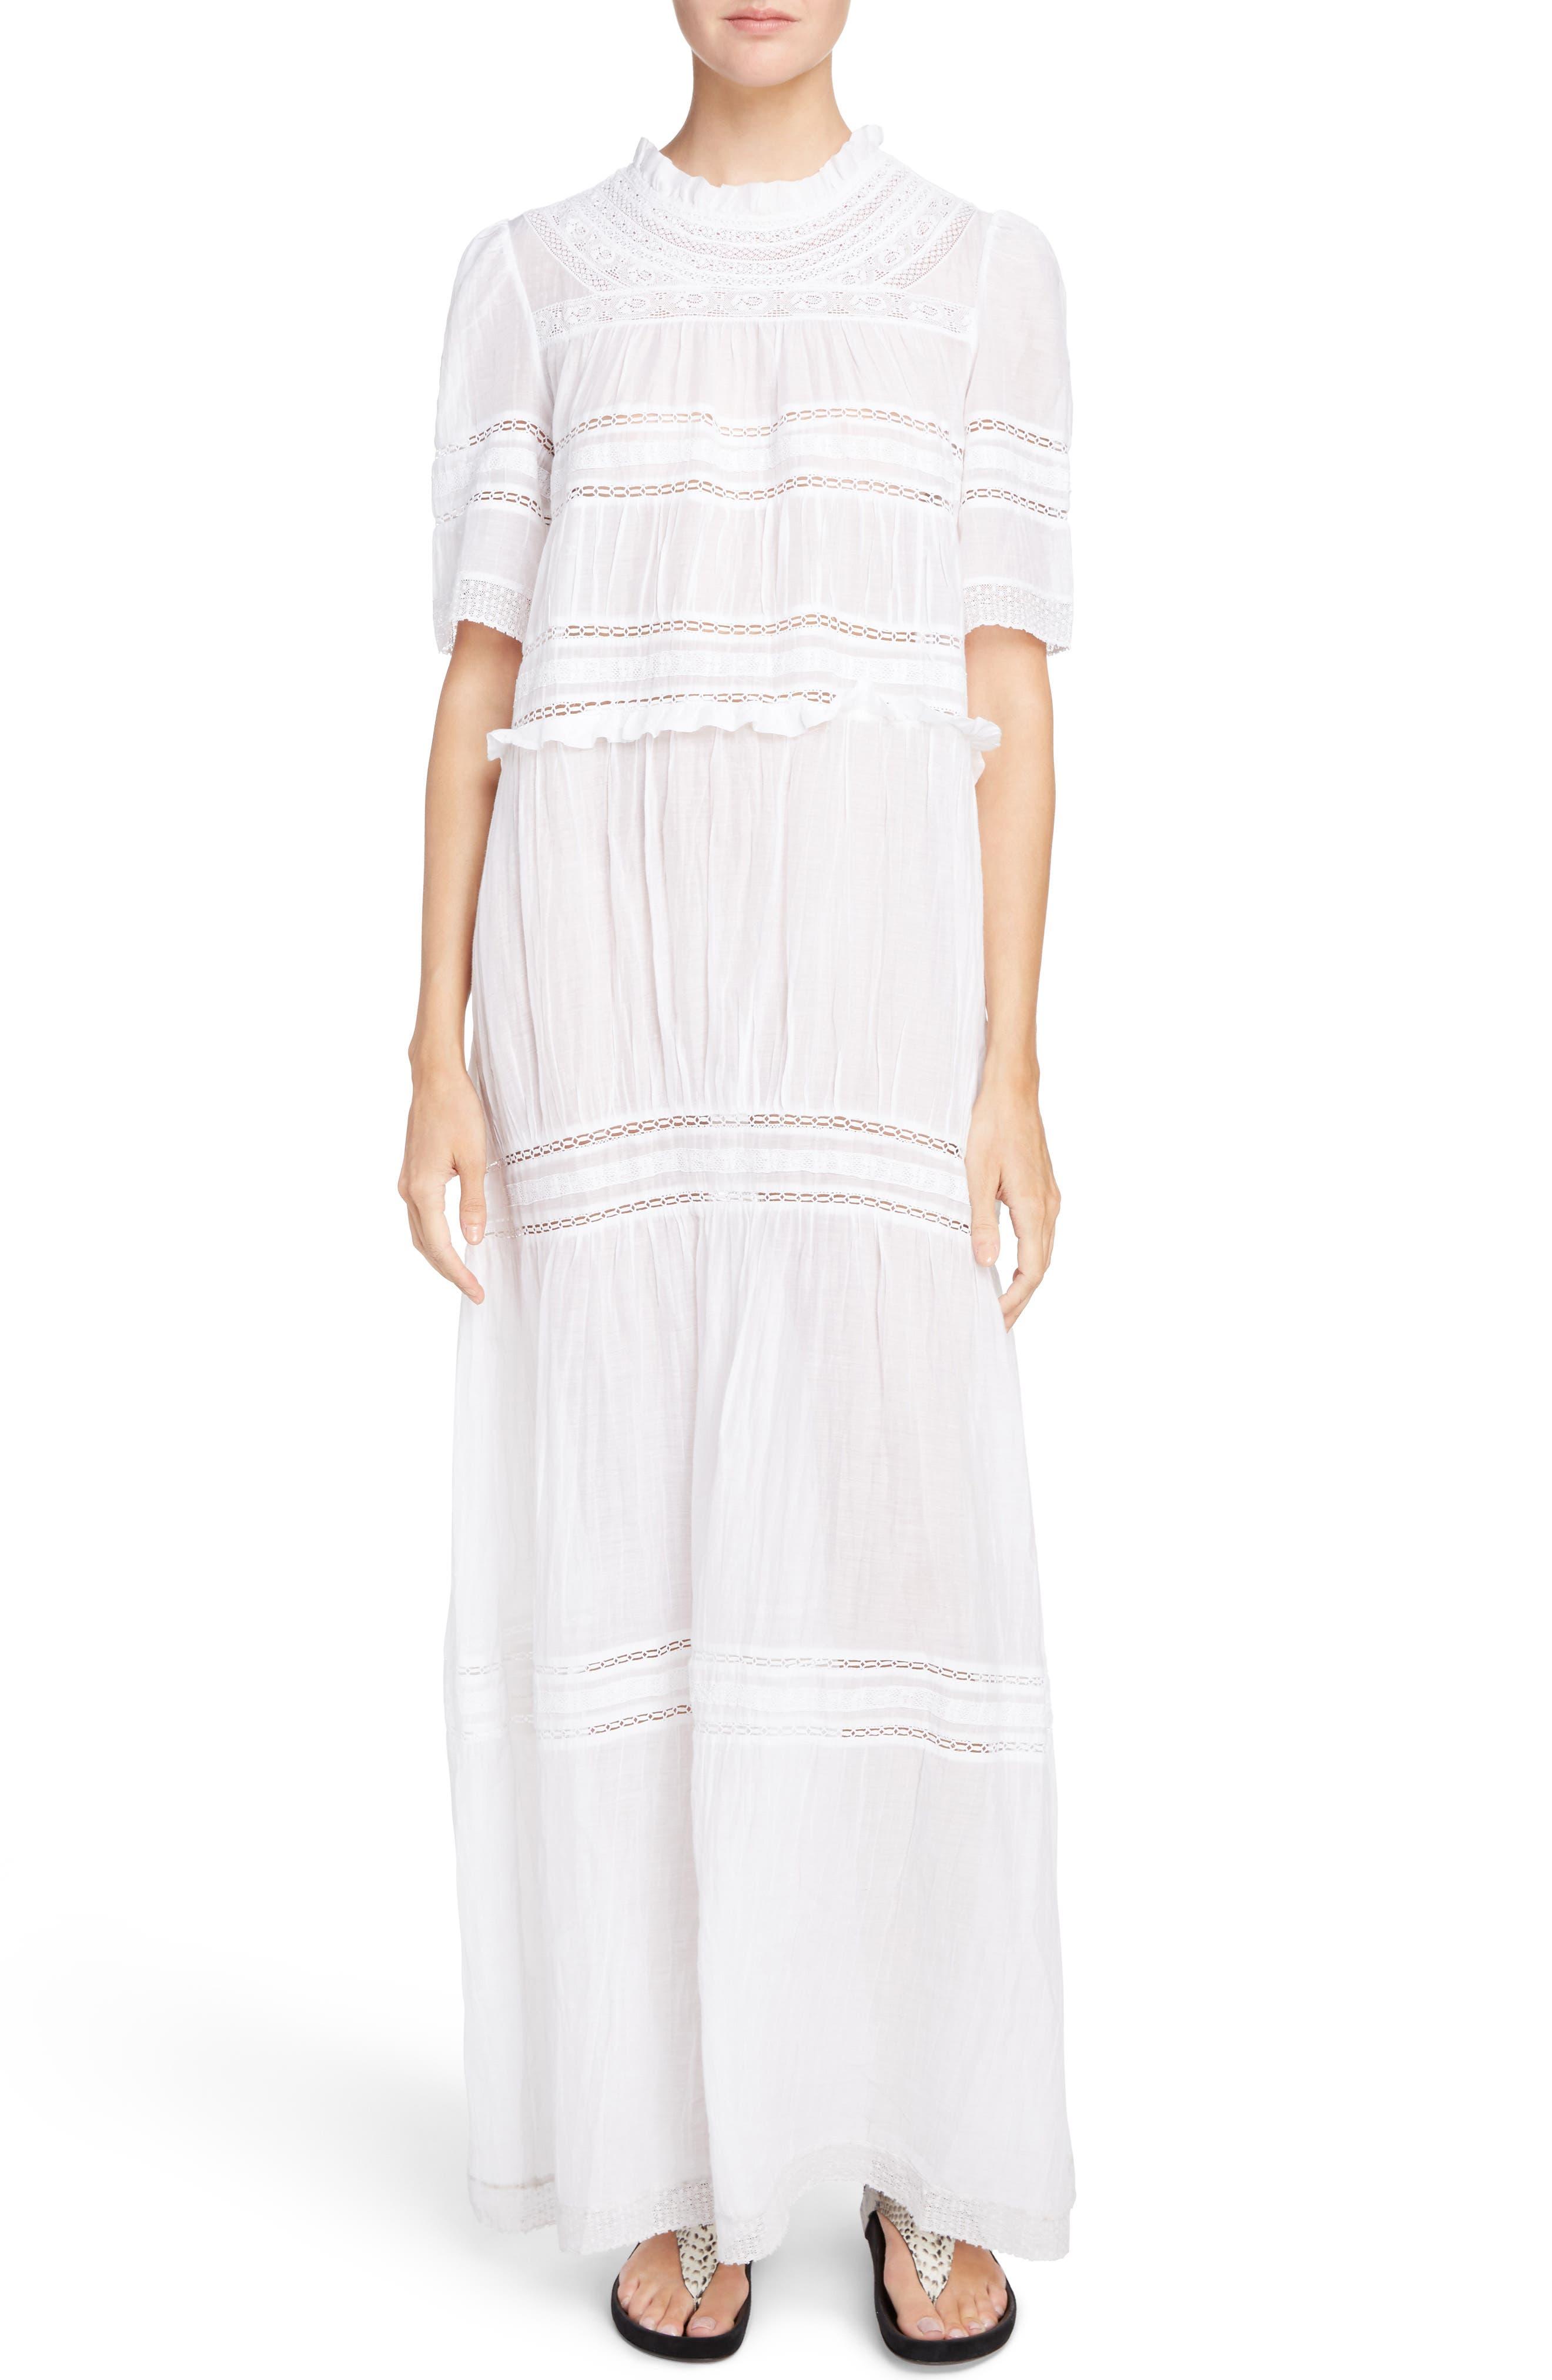 Vealy Maxi Dress,                             Main thumbnail 1, color,                             100